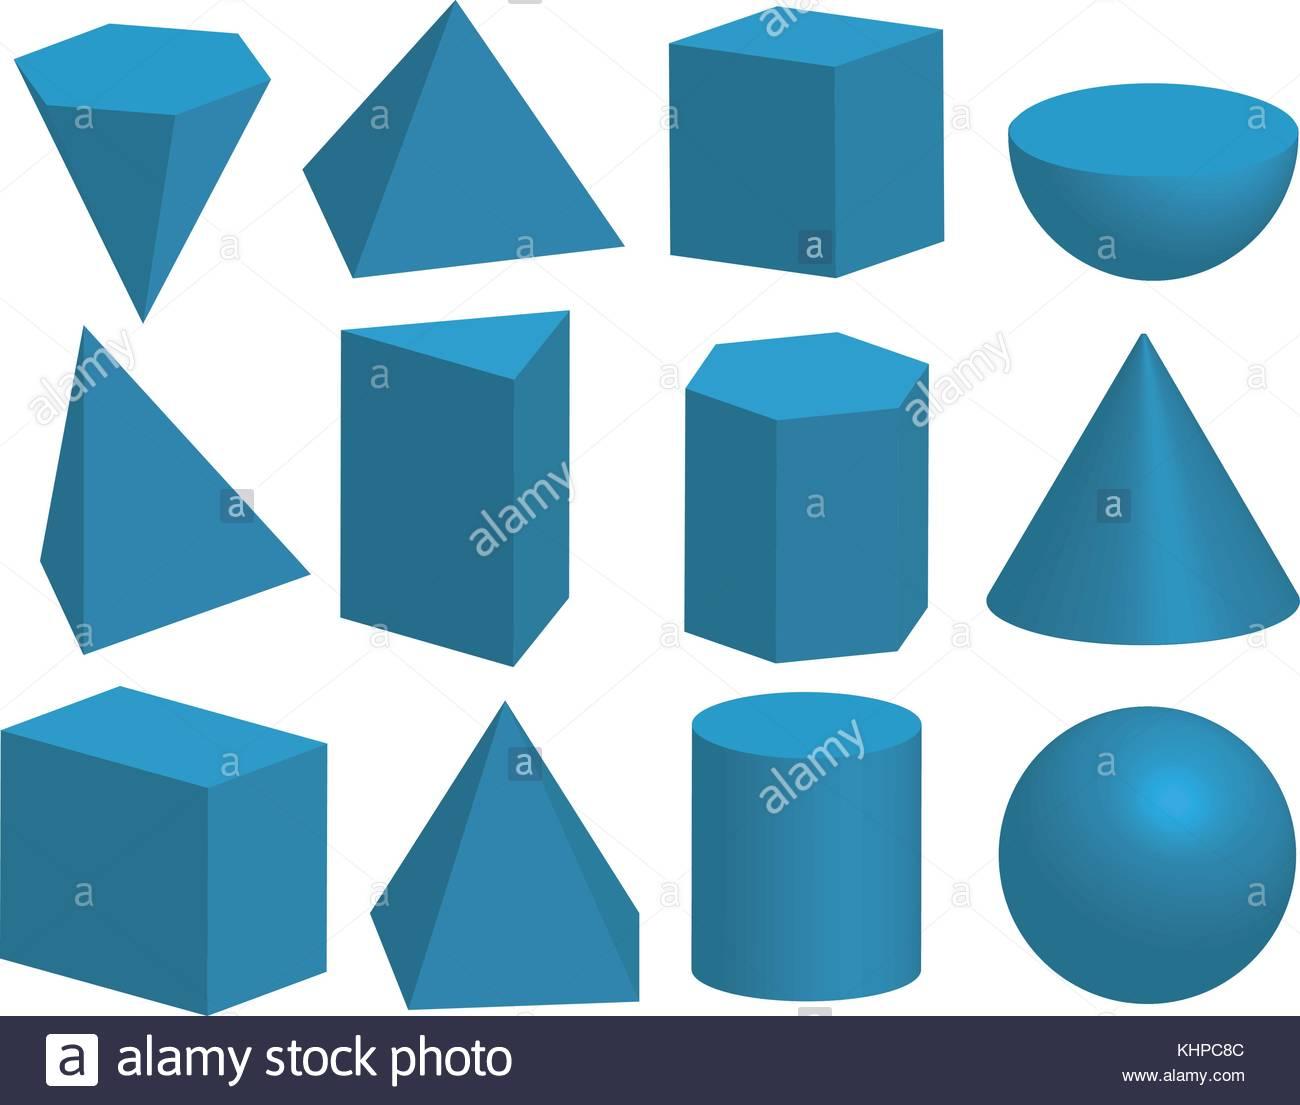 Basic 3d Geometric Shapes Geometric Solids Pyramid